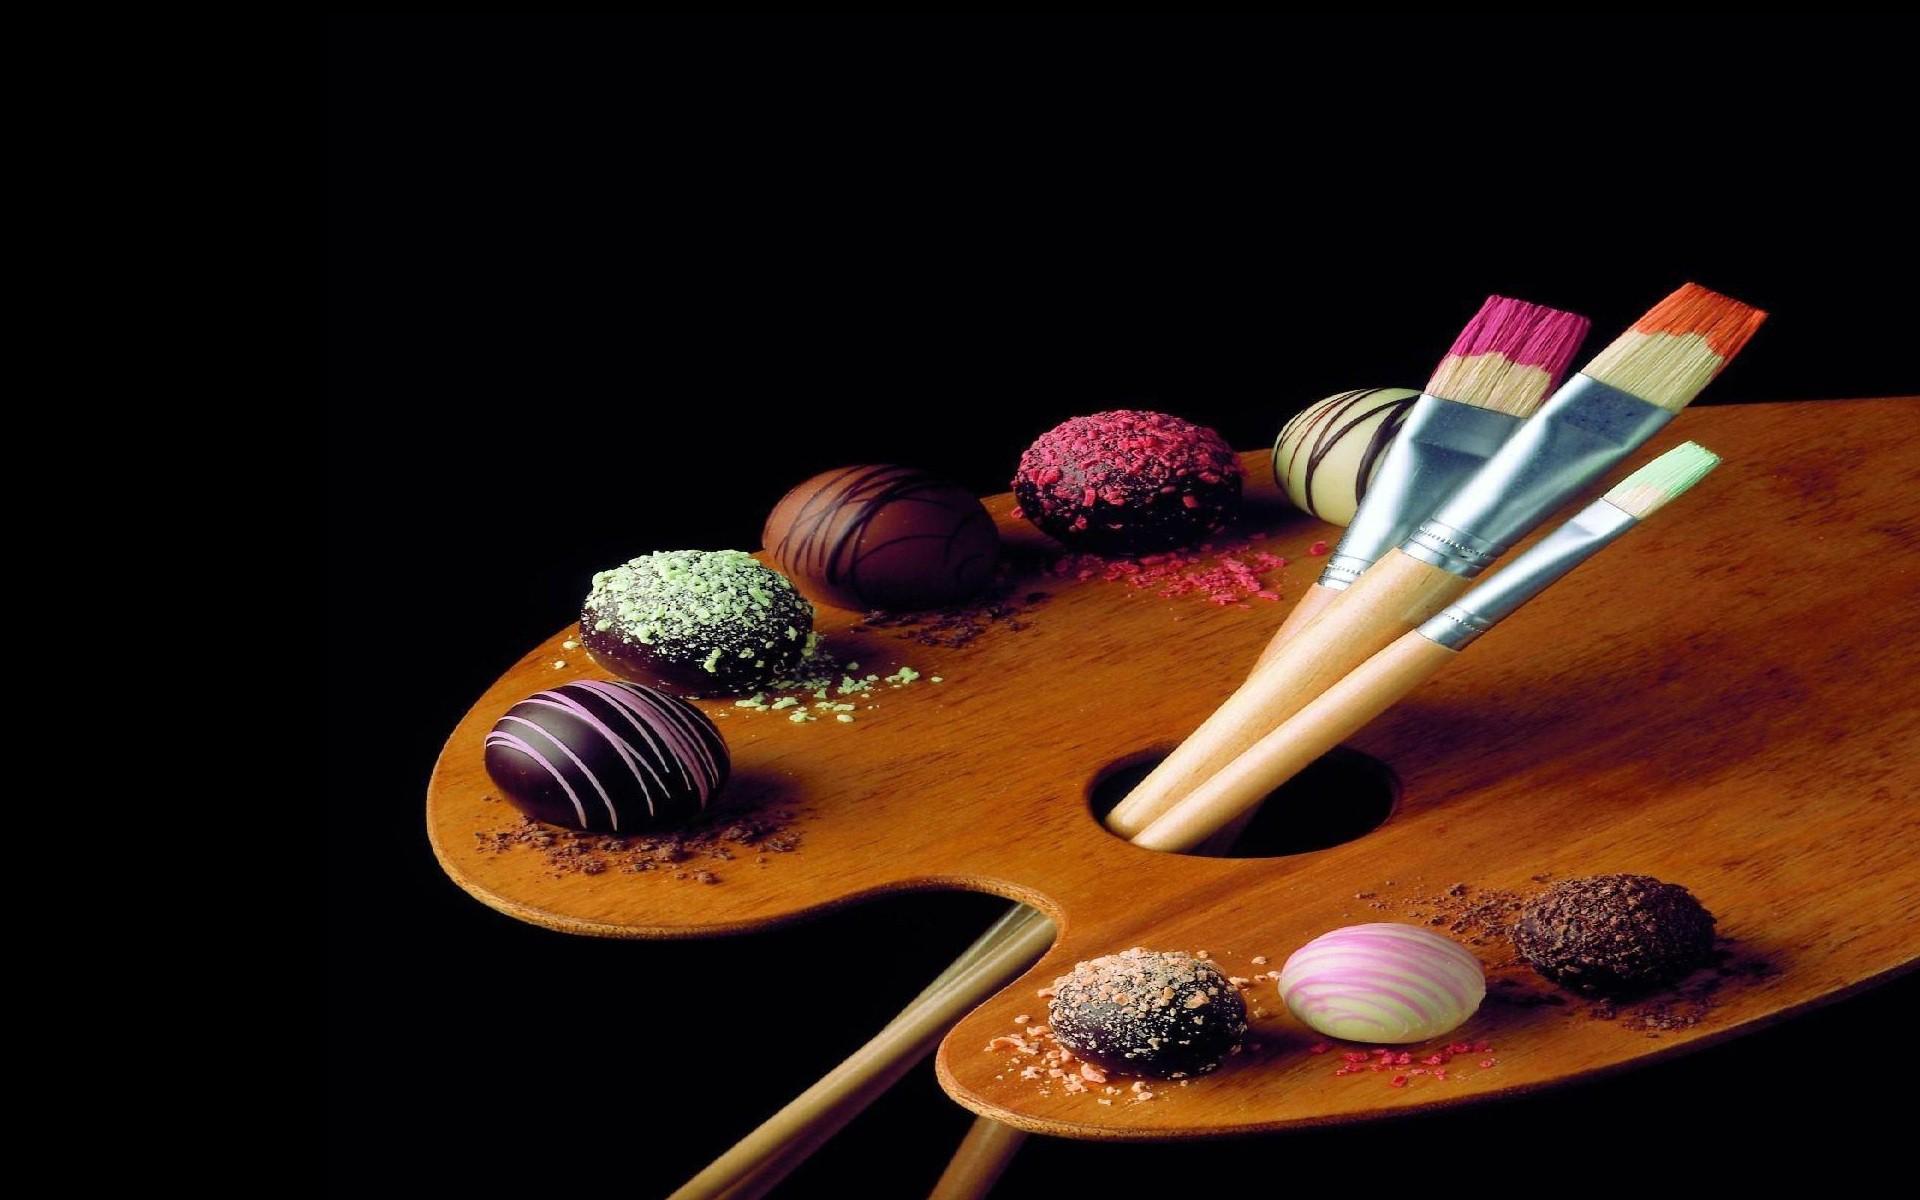 La paleta de un artista - 1920x1200